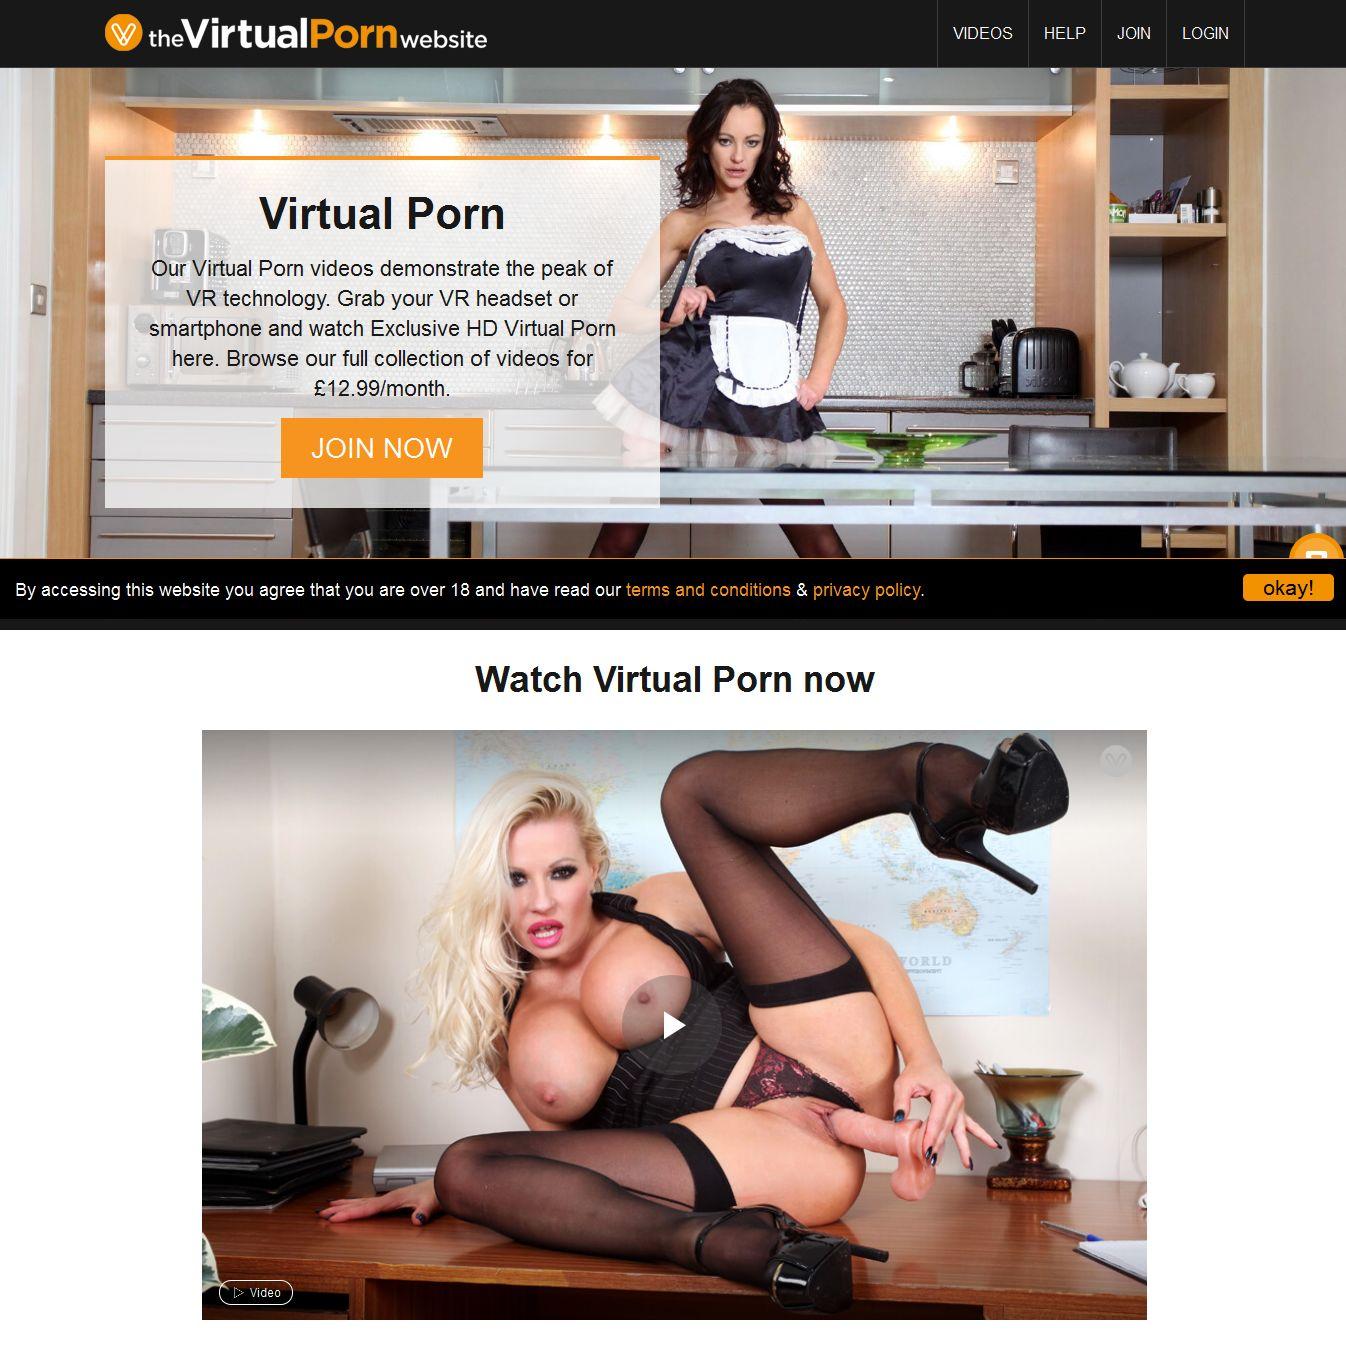 The Virtual Porn Website